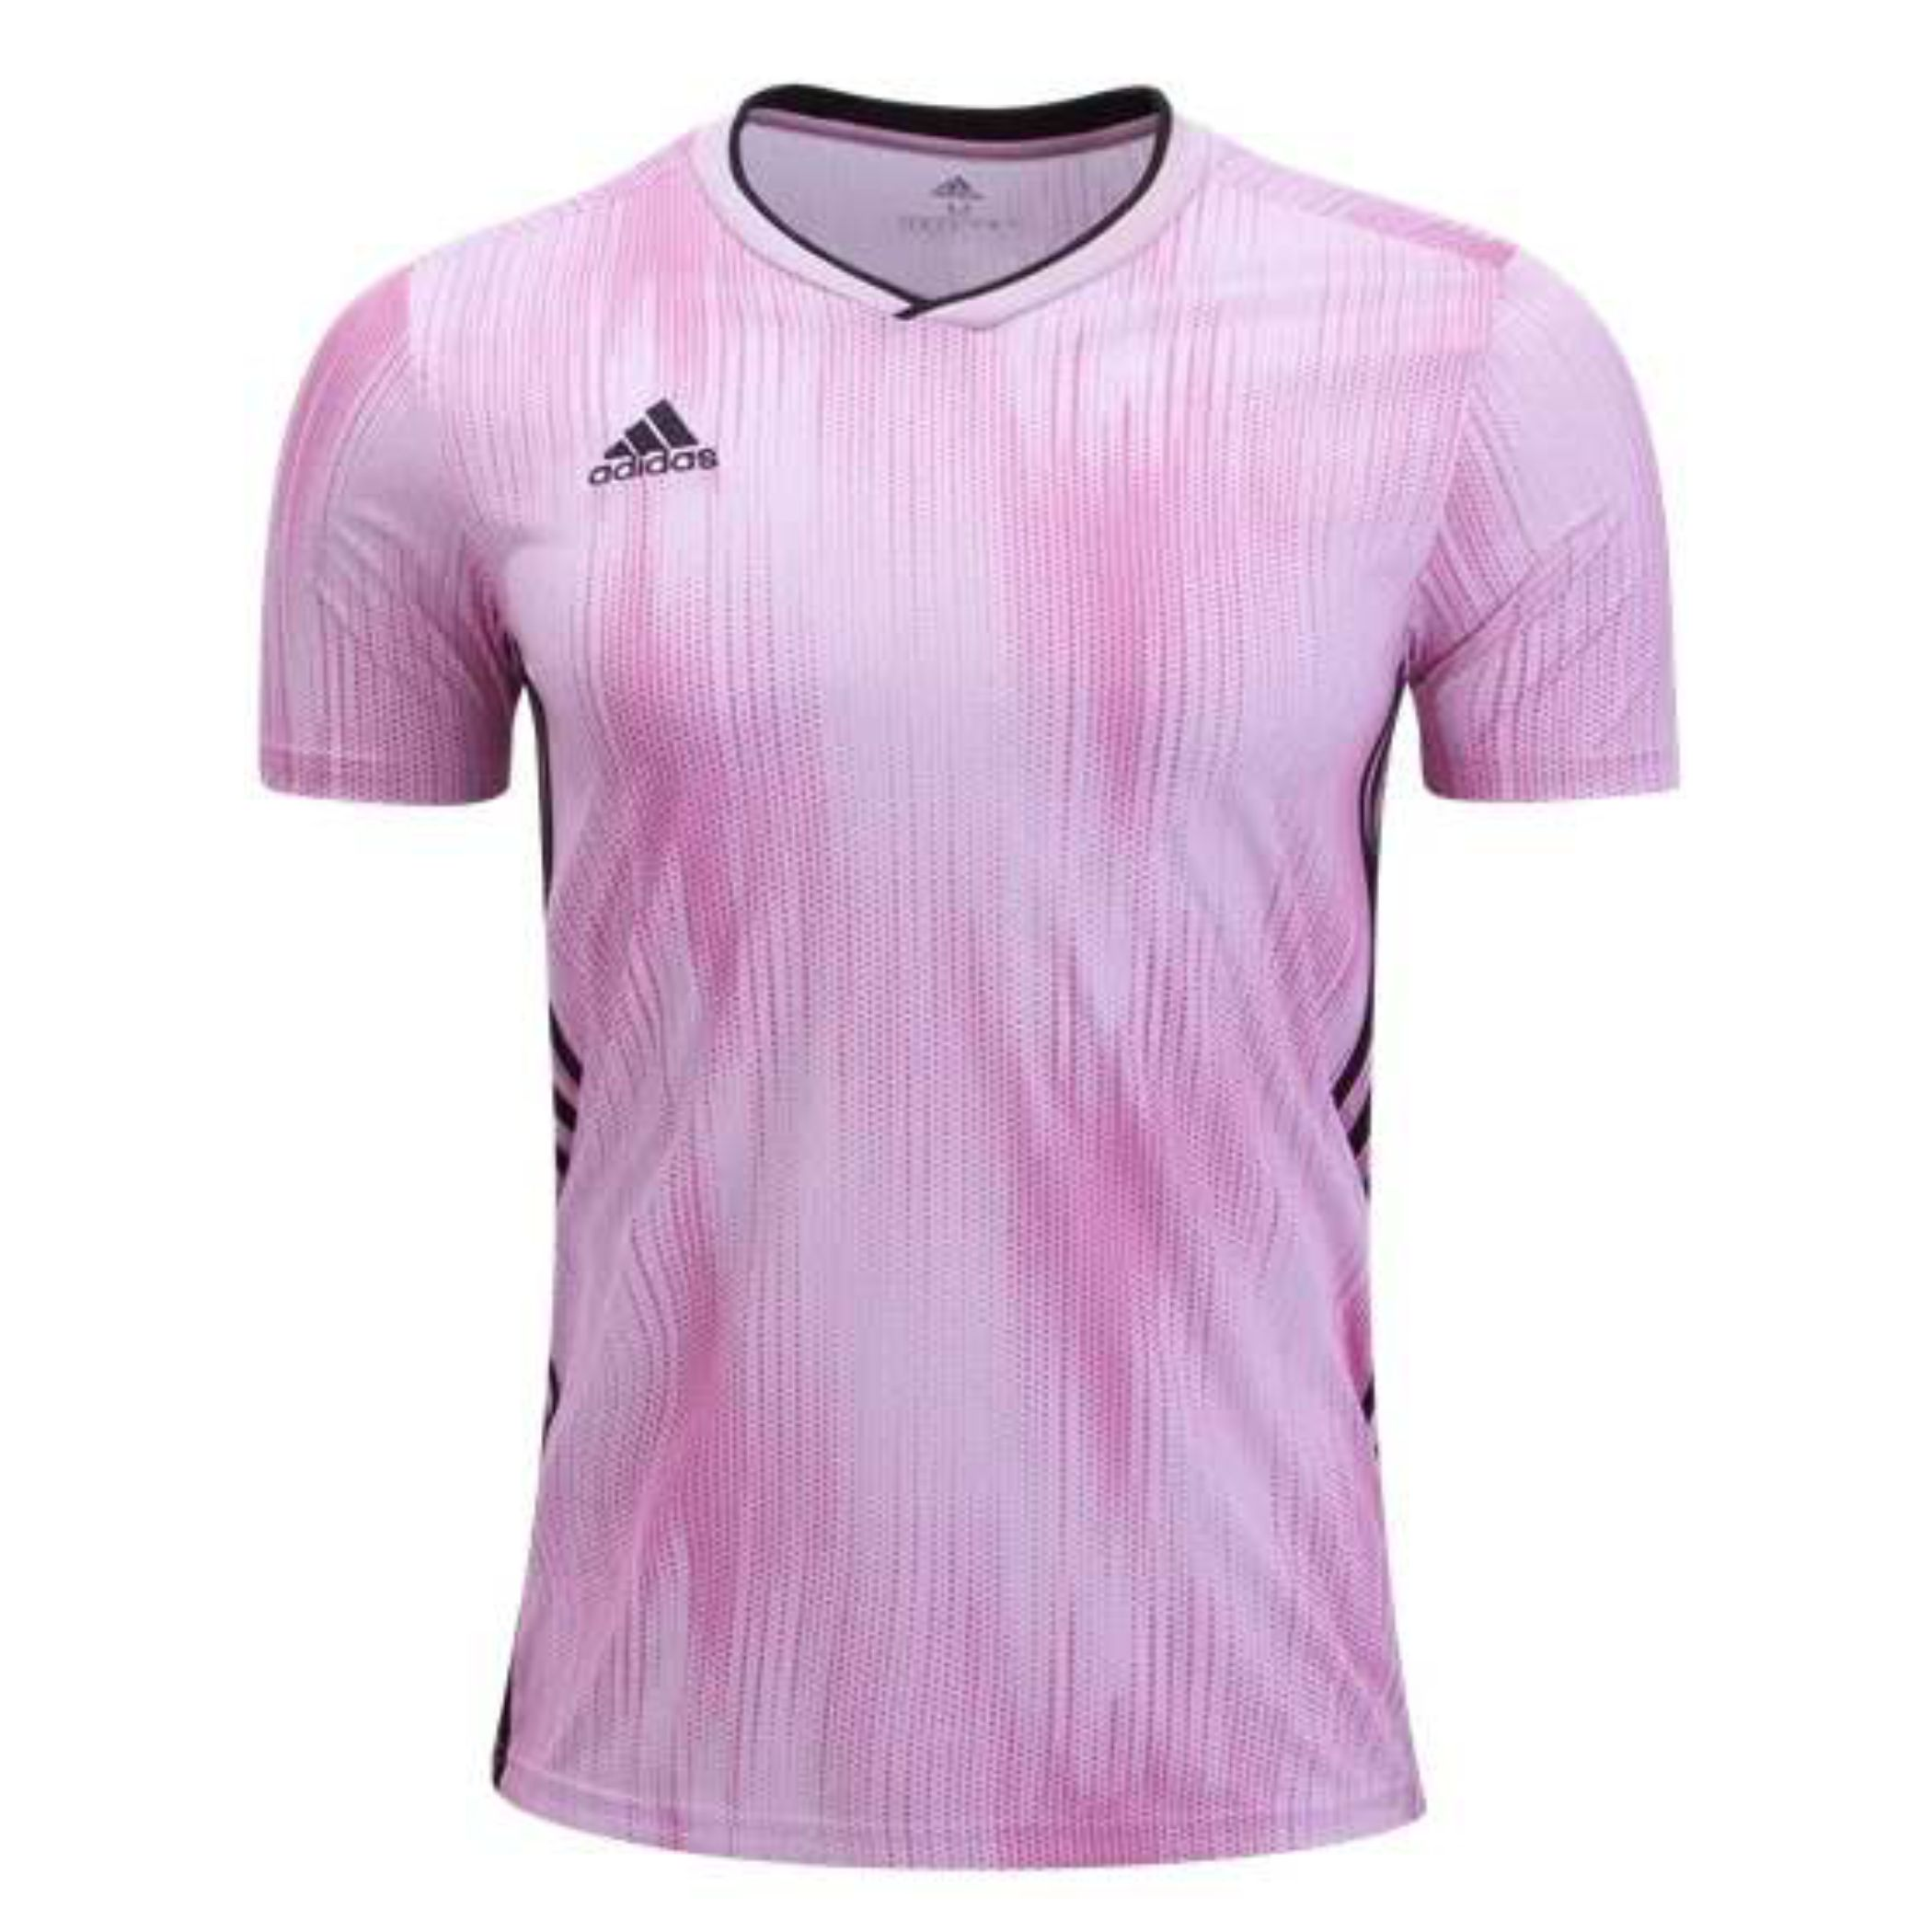 adidas Tiro 19 Jersey - Pink/Black